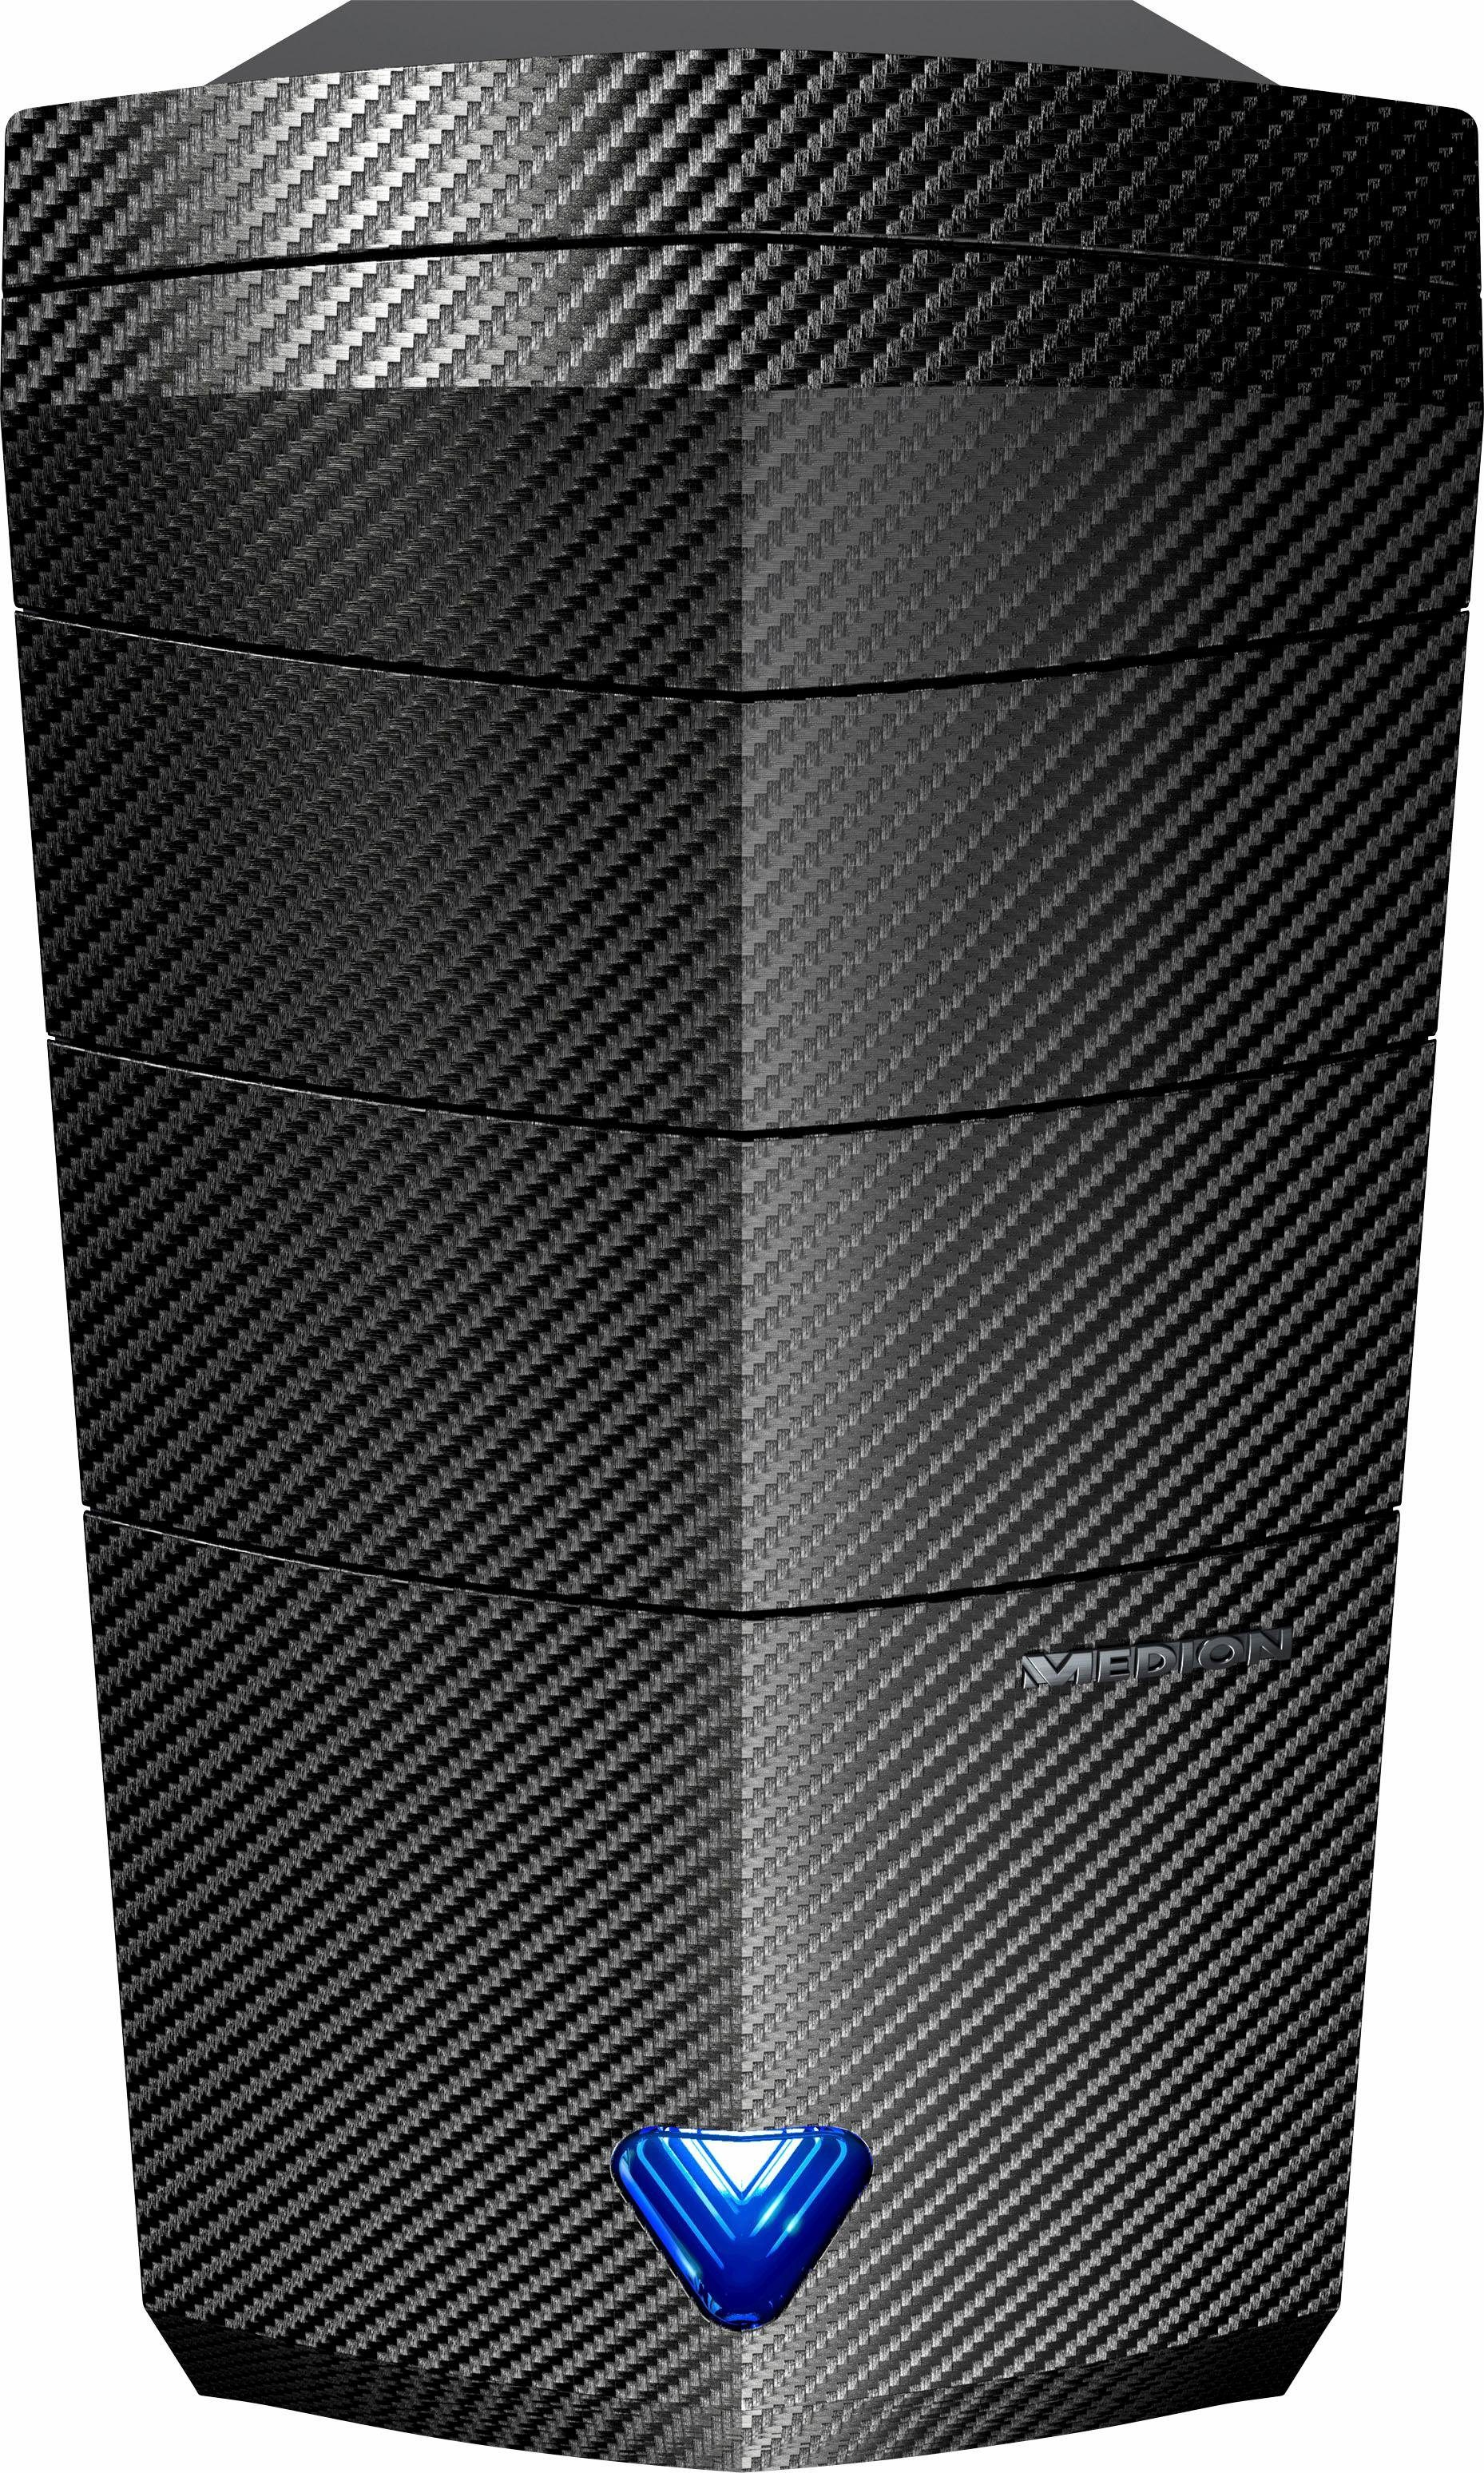 Medion® AKOYA P5709 D, AMD Ryzen™ 5, 16384 MB DDR4, NVIDIA Geforce GTX 1050 Ti